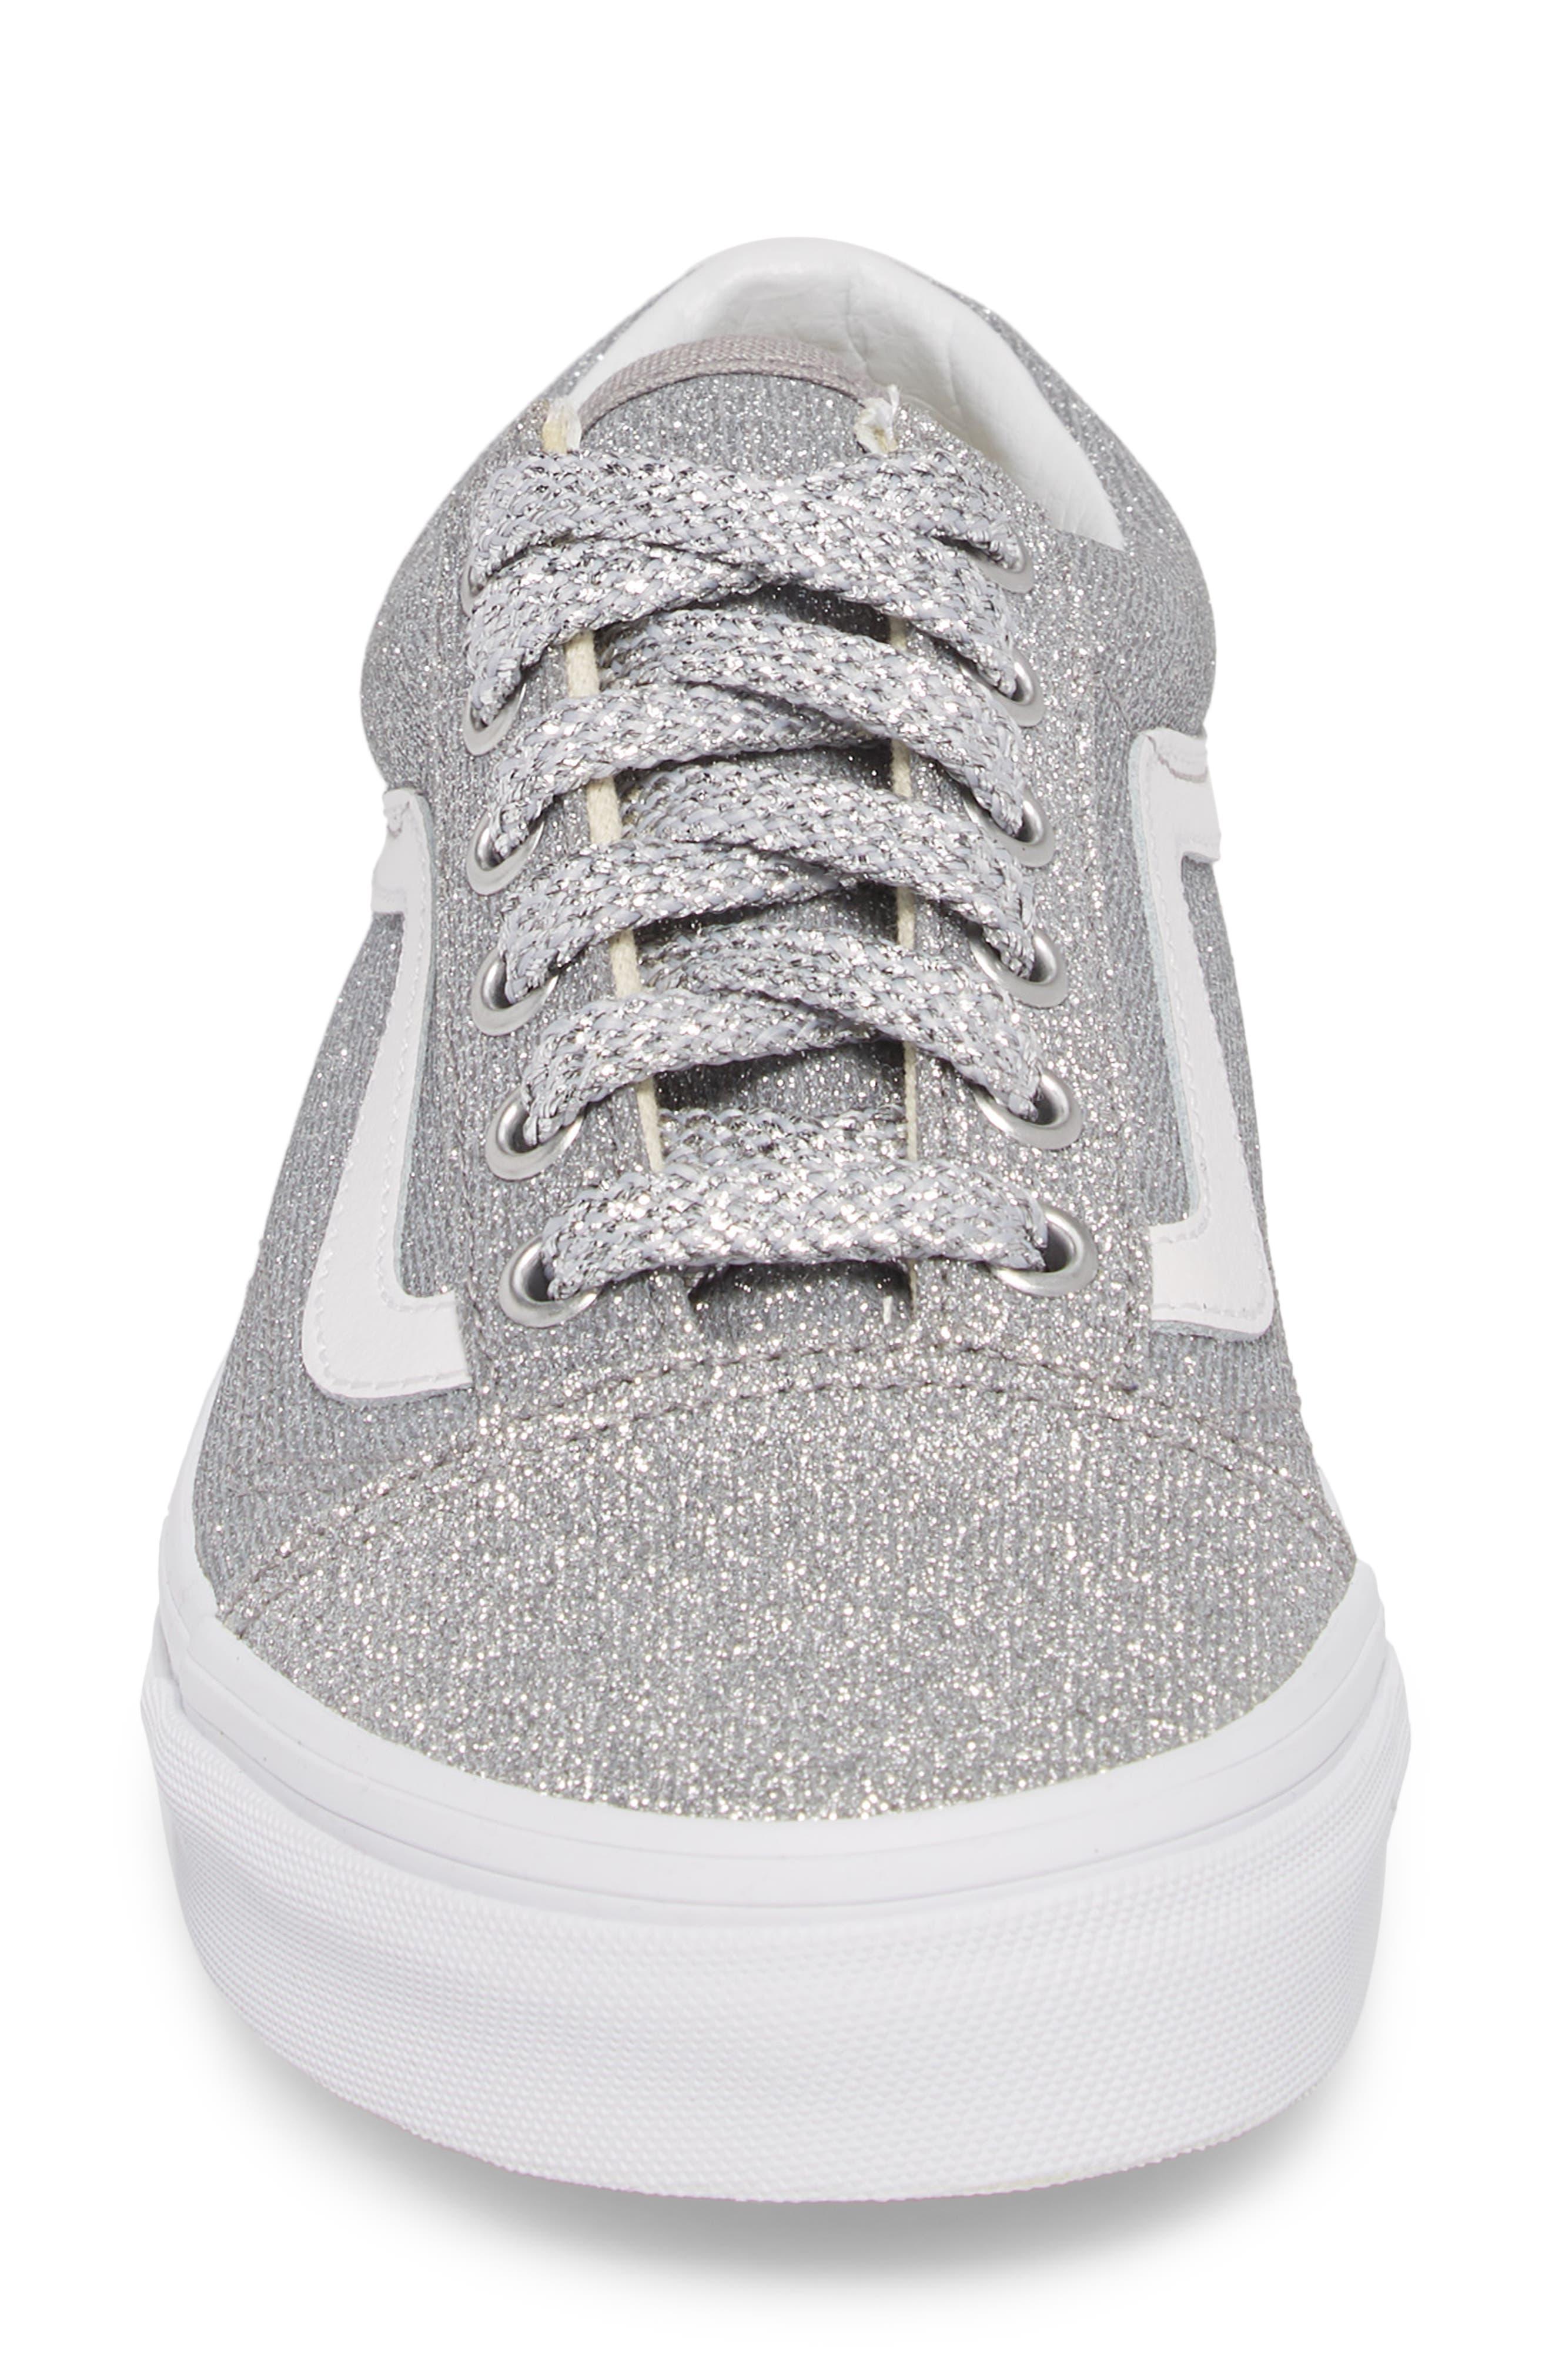 UA Old Skool Glitter Low Top Sneaker,                             Alternate thumbnail 4, color,                             SILVER/ TRUE WHITE GLITTER